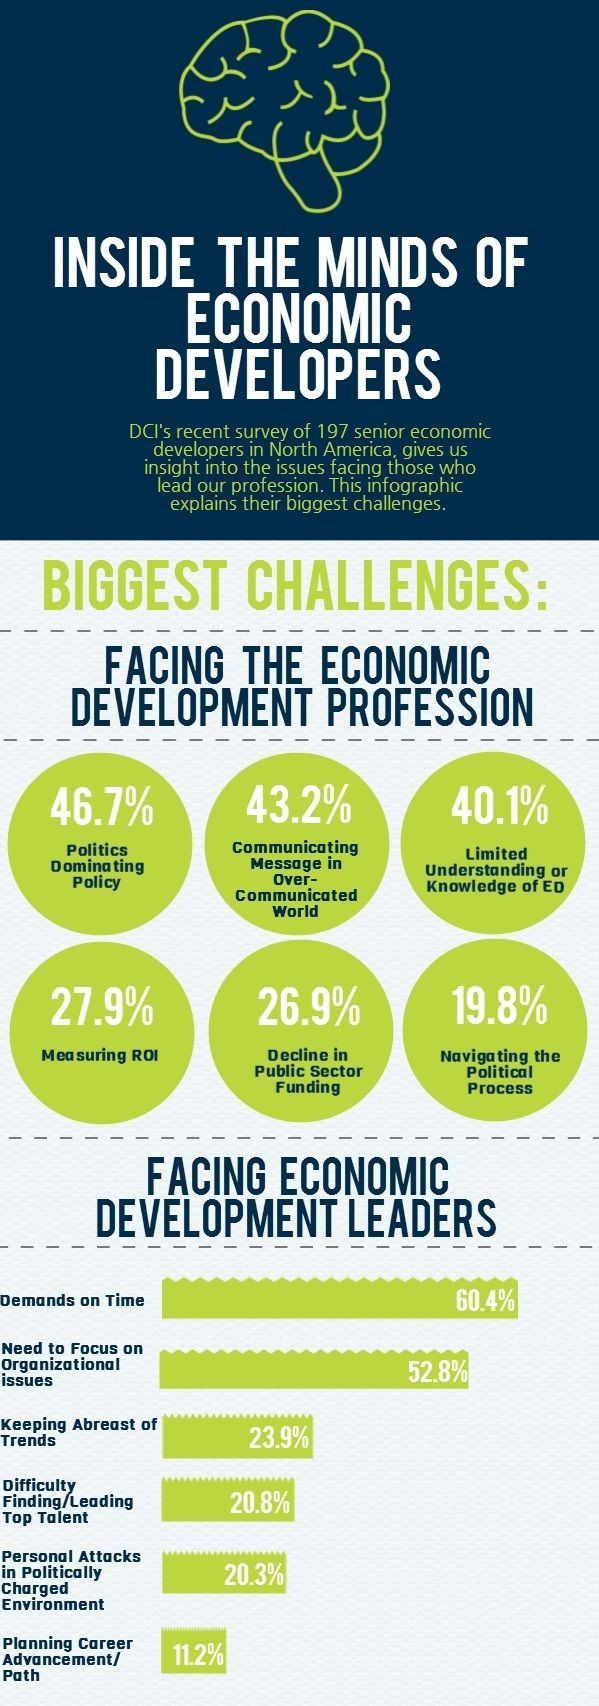 Biggest Challenges in Economic Development #infographic #econdev